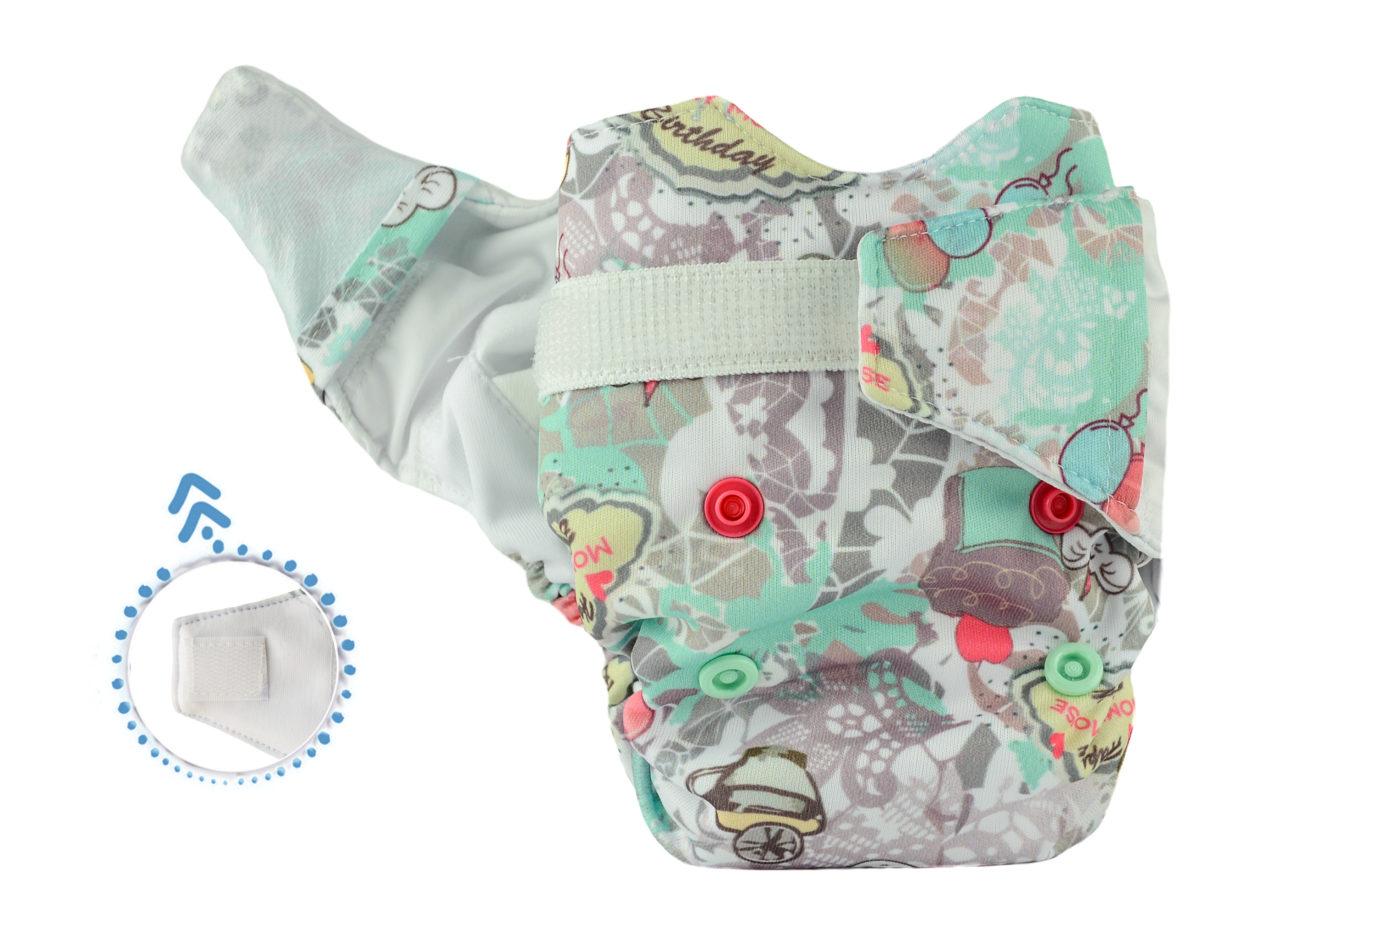 Pieluszka AIO Newborn (BIRTHDAYS)